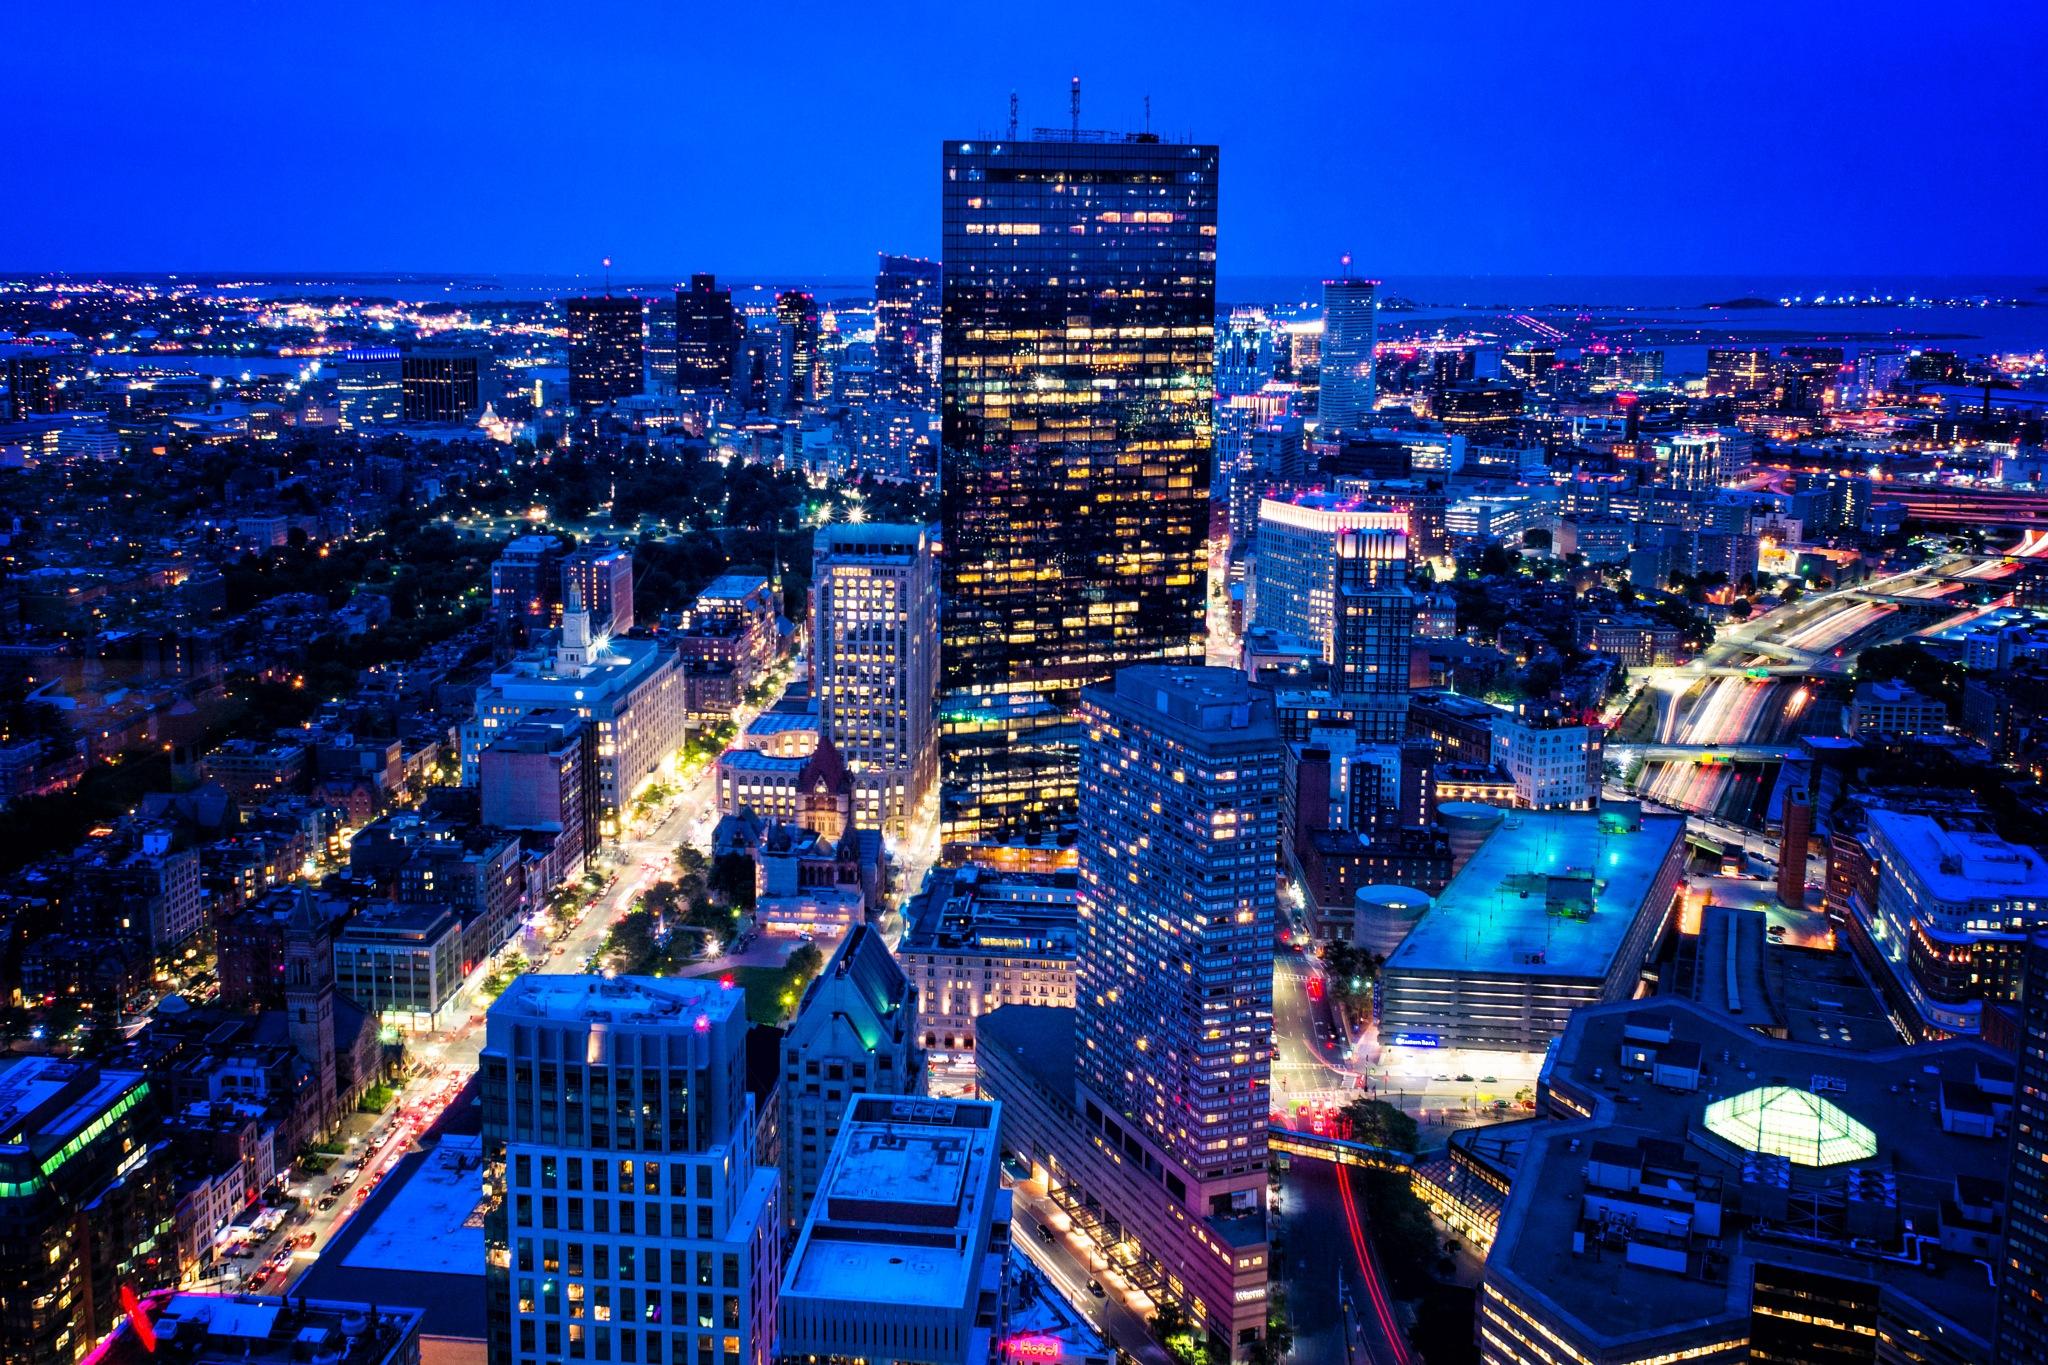 Boston Nightfall by Donny Campos